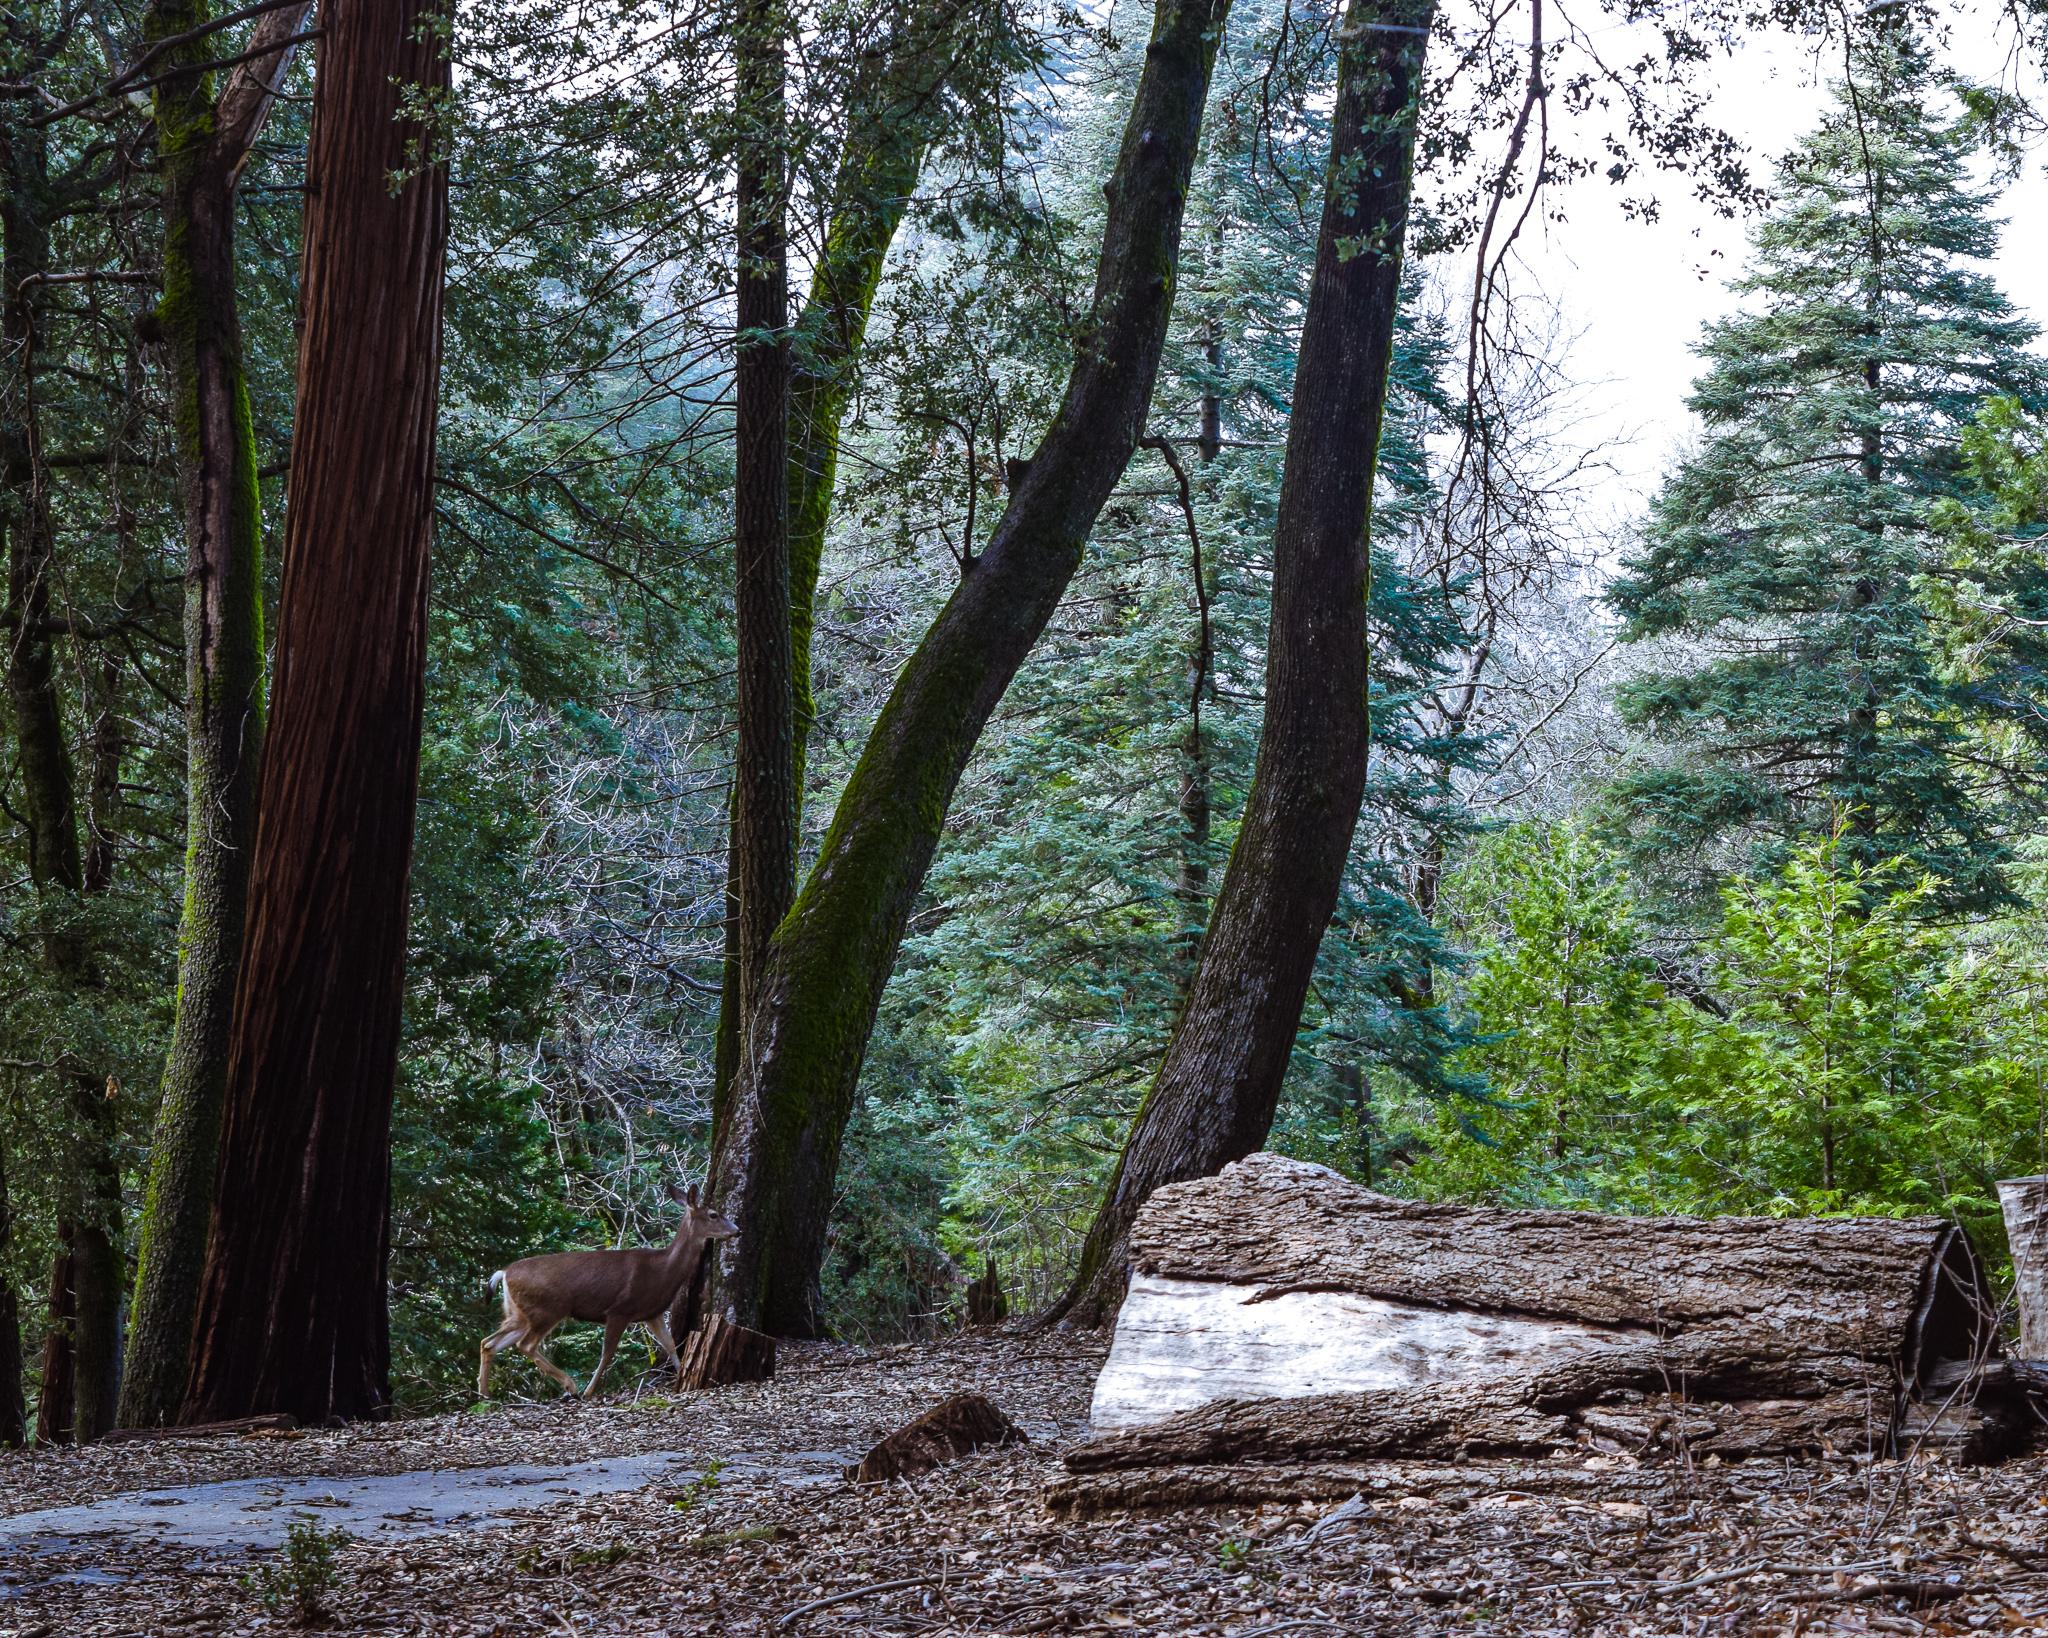 palomar mountain state park california deer in woods